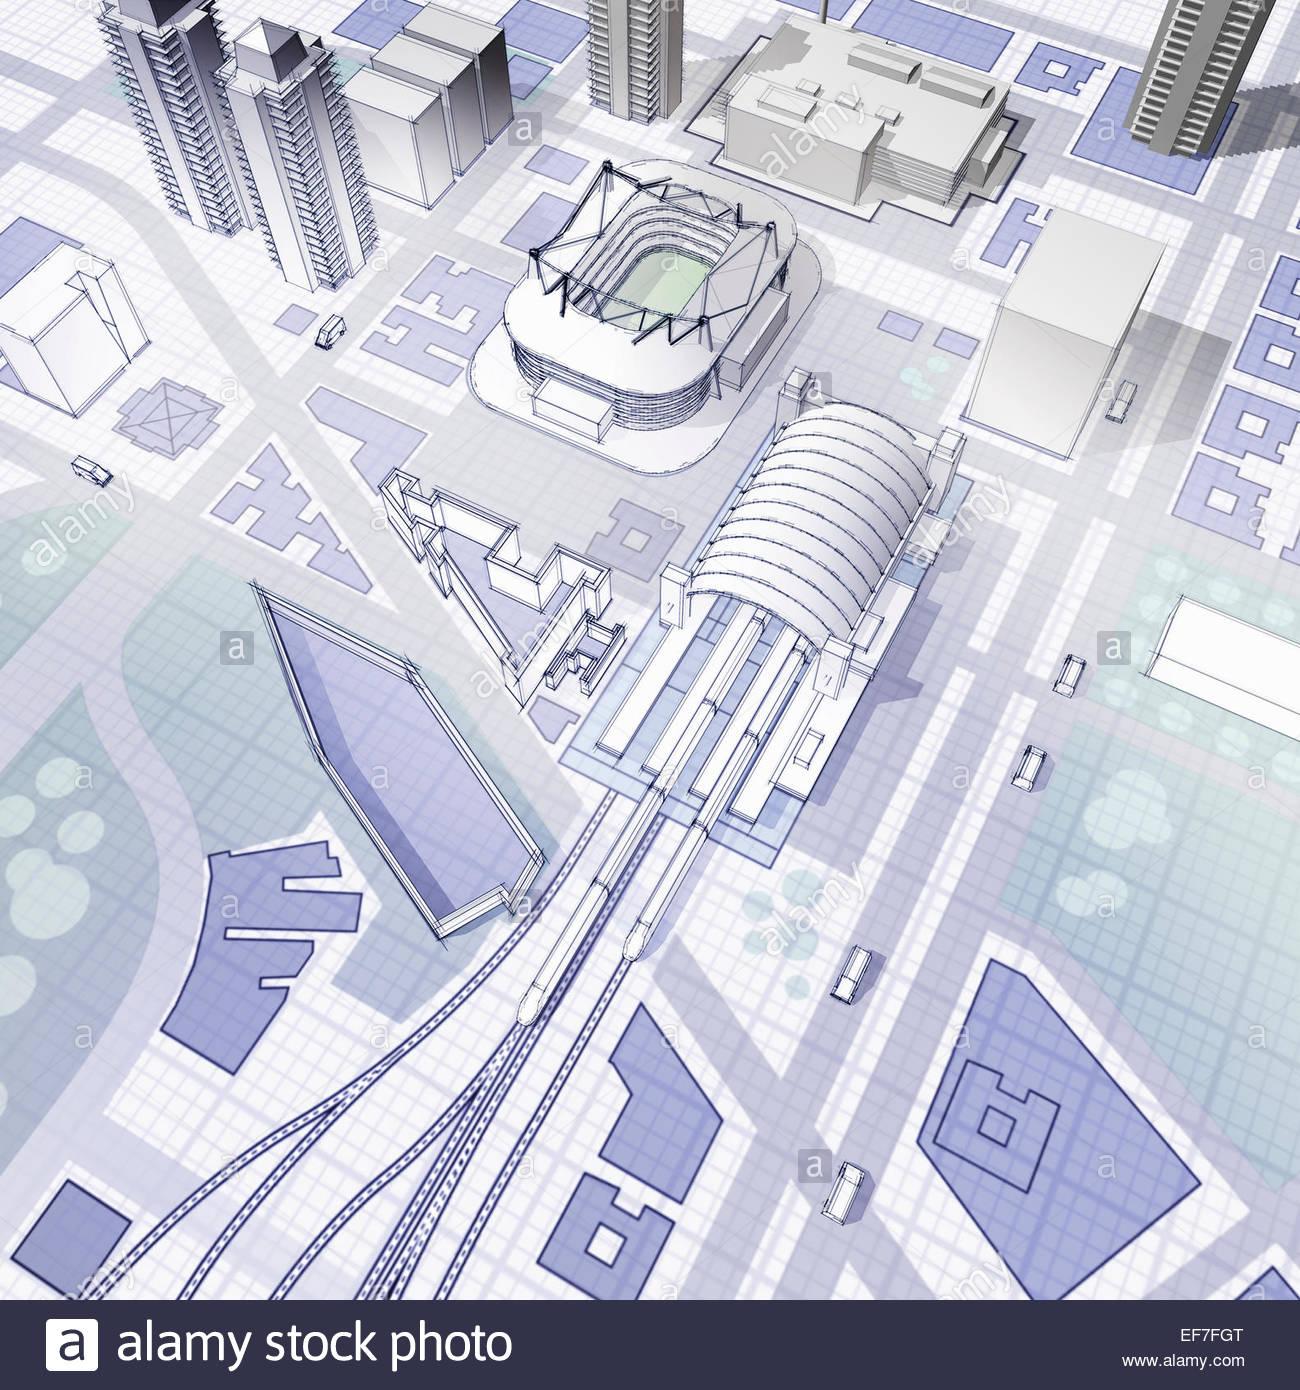 Blueprint of urban planning stock photo 78227208 alamy blueprint of urban planning malvernweather Gallery